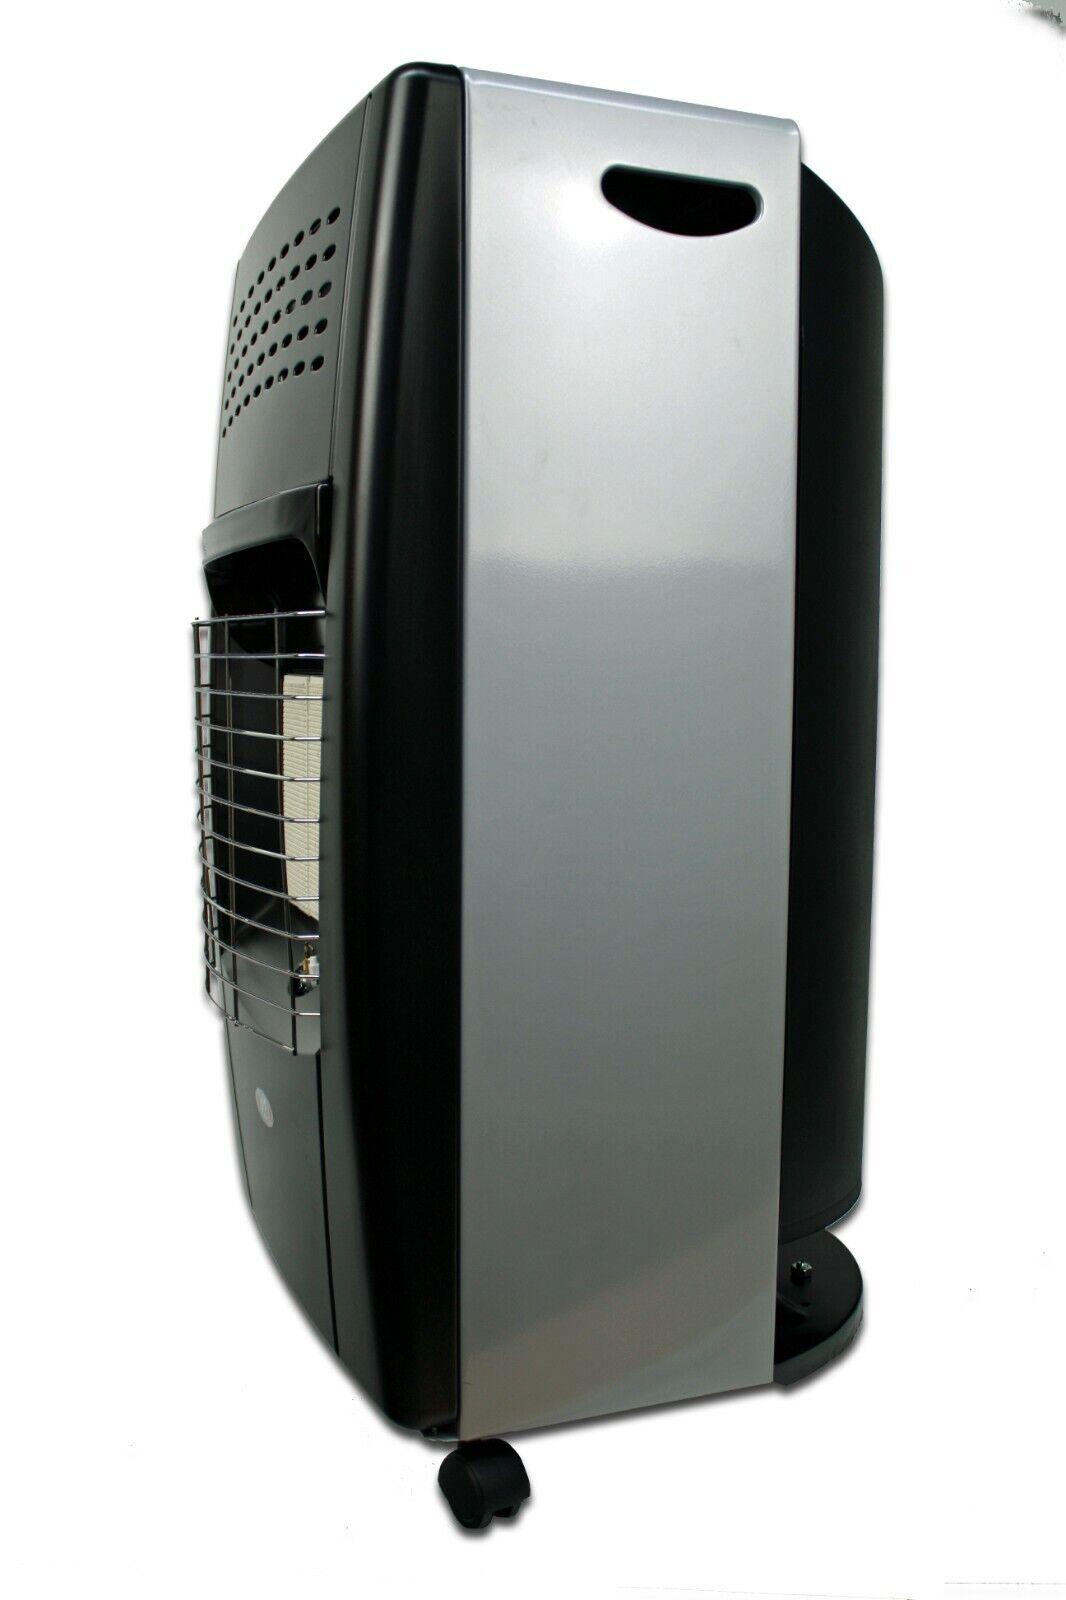 TGO Infrarot Heizofen Magica-Ideal 4,2 kW 28cm Gerätetiefe und Rückverblendung